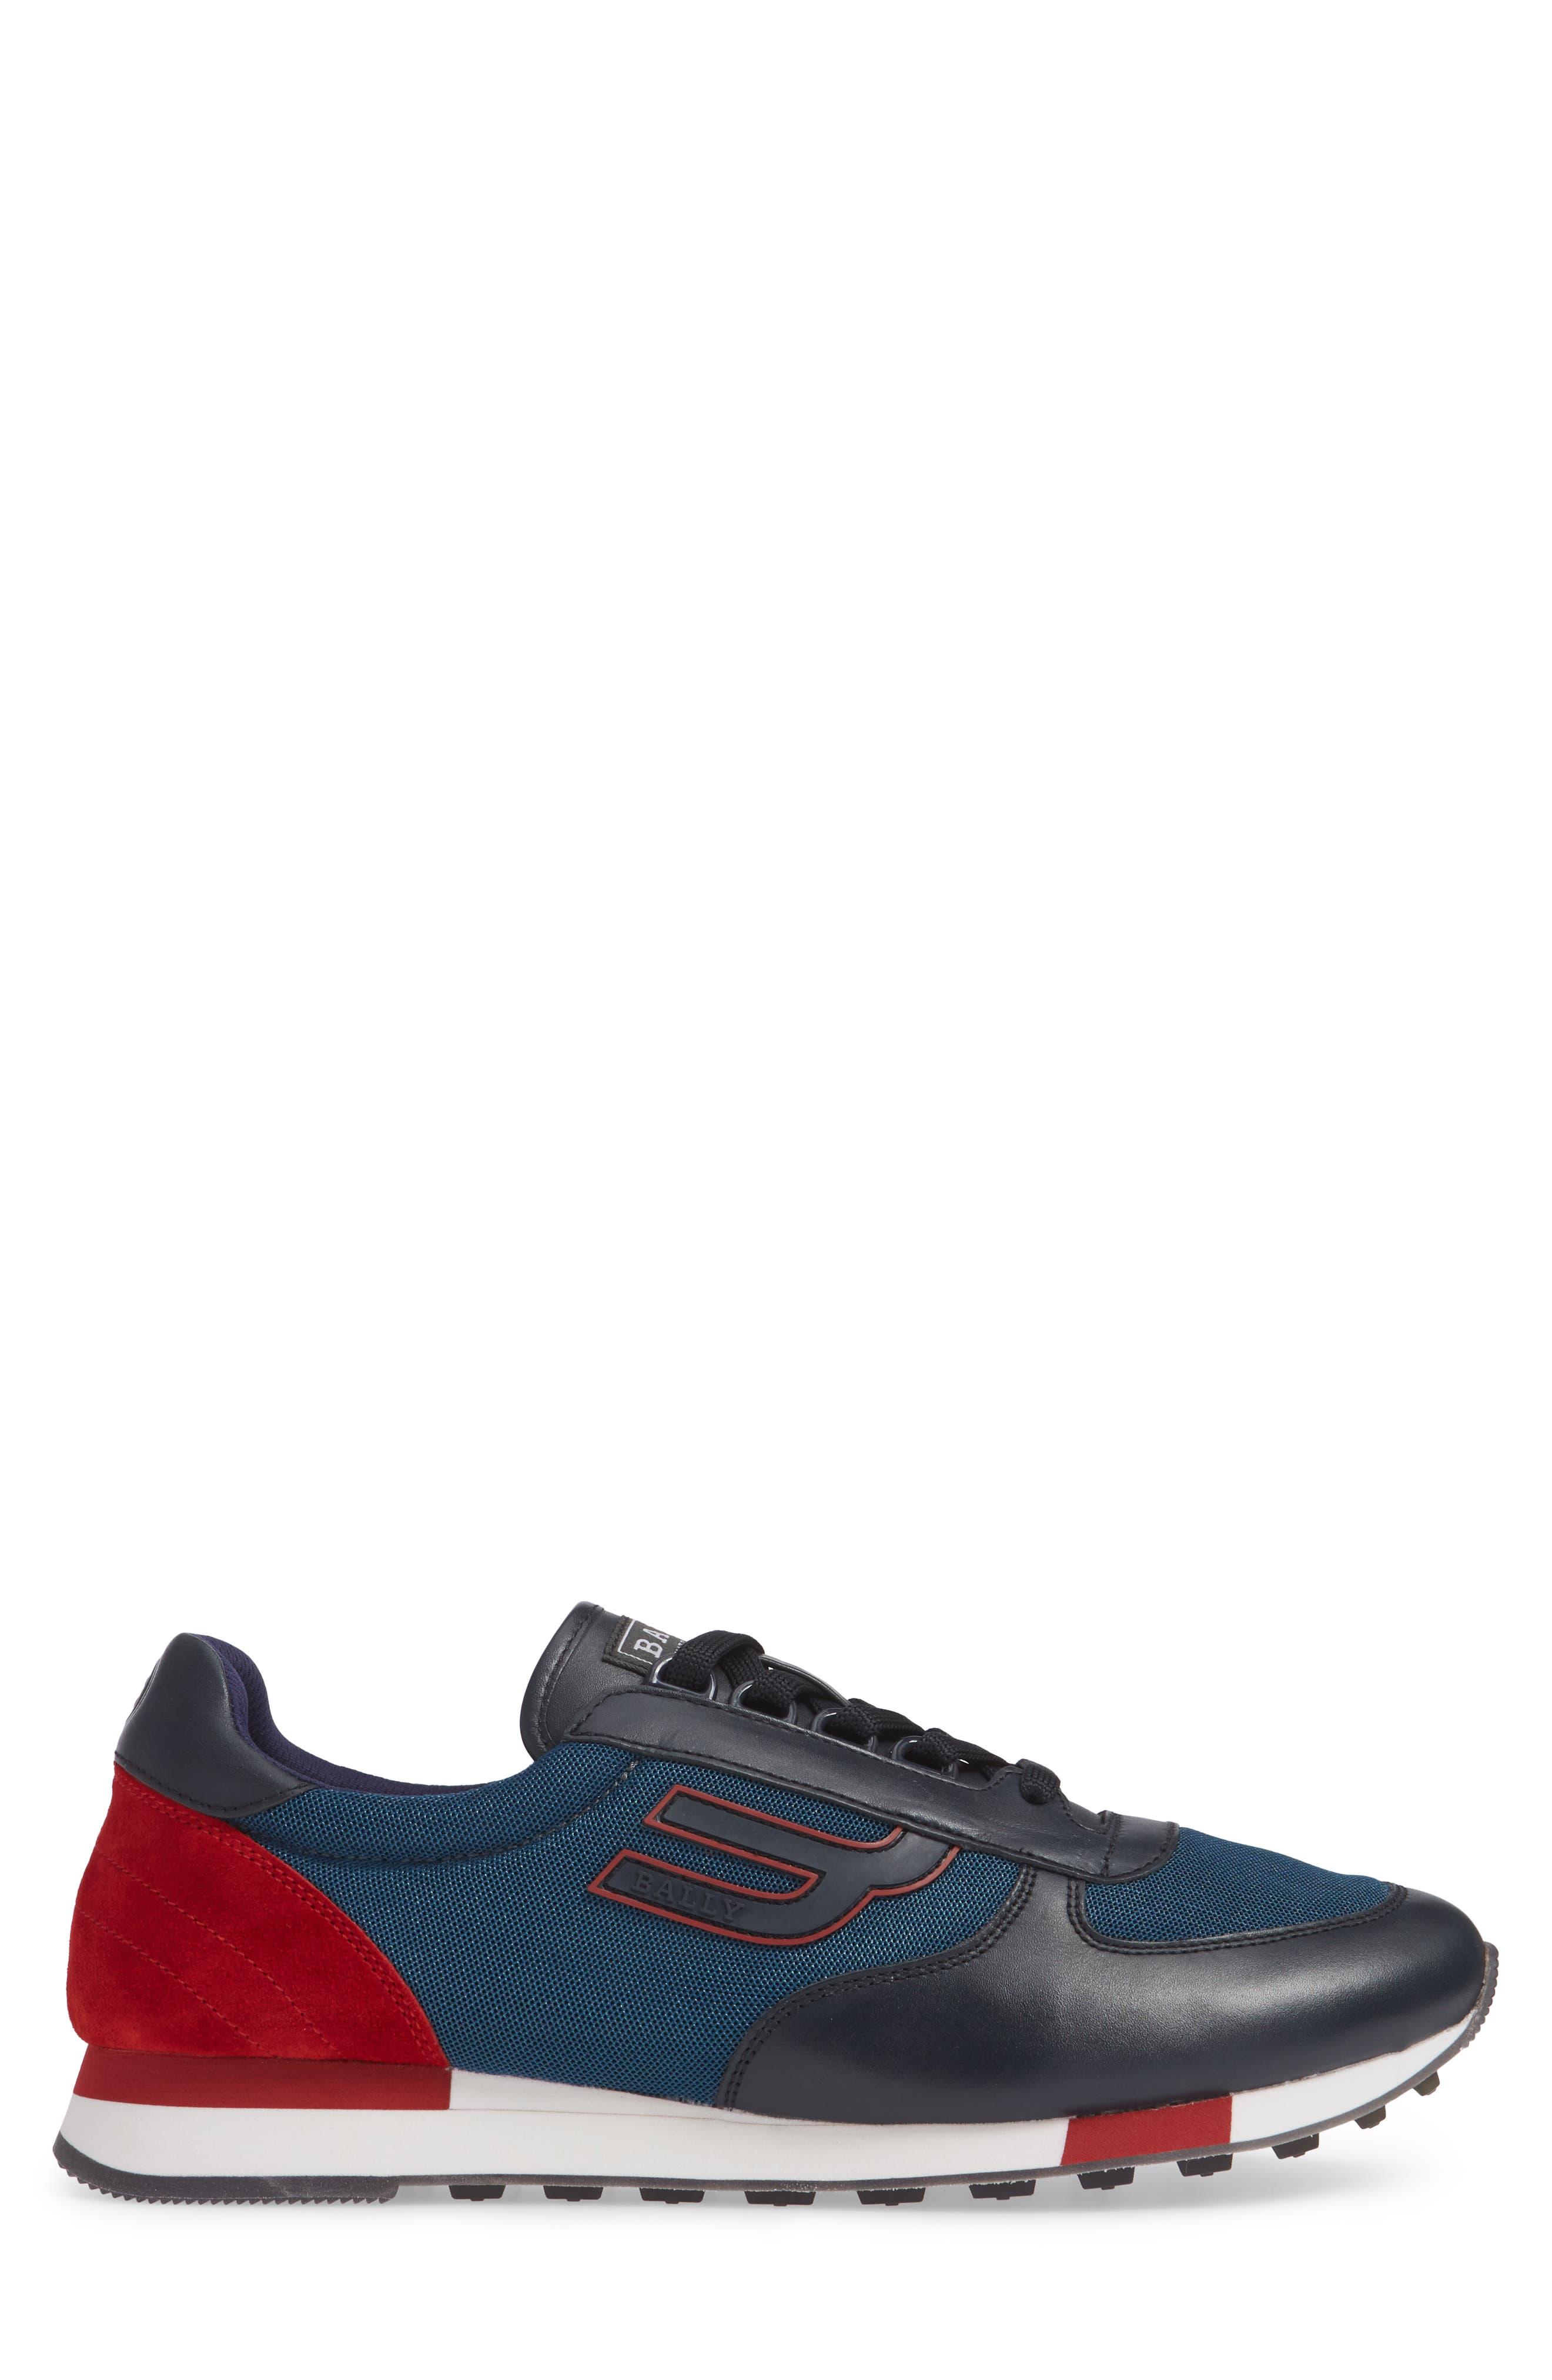 Gavino Low Top Sneaker,                             Alternate thumbnail 4, color,                             Blue